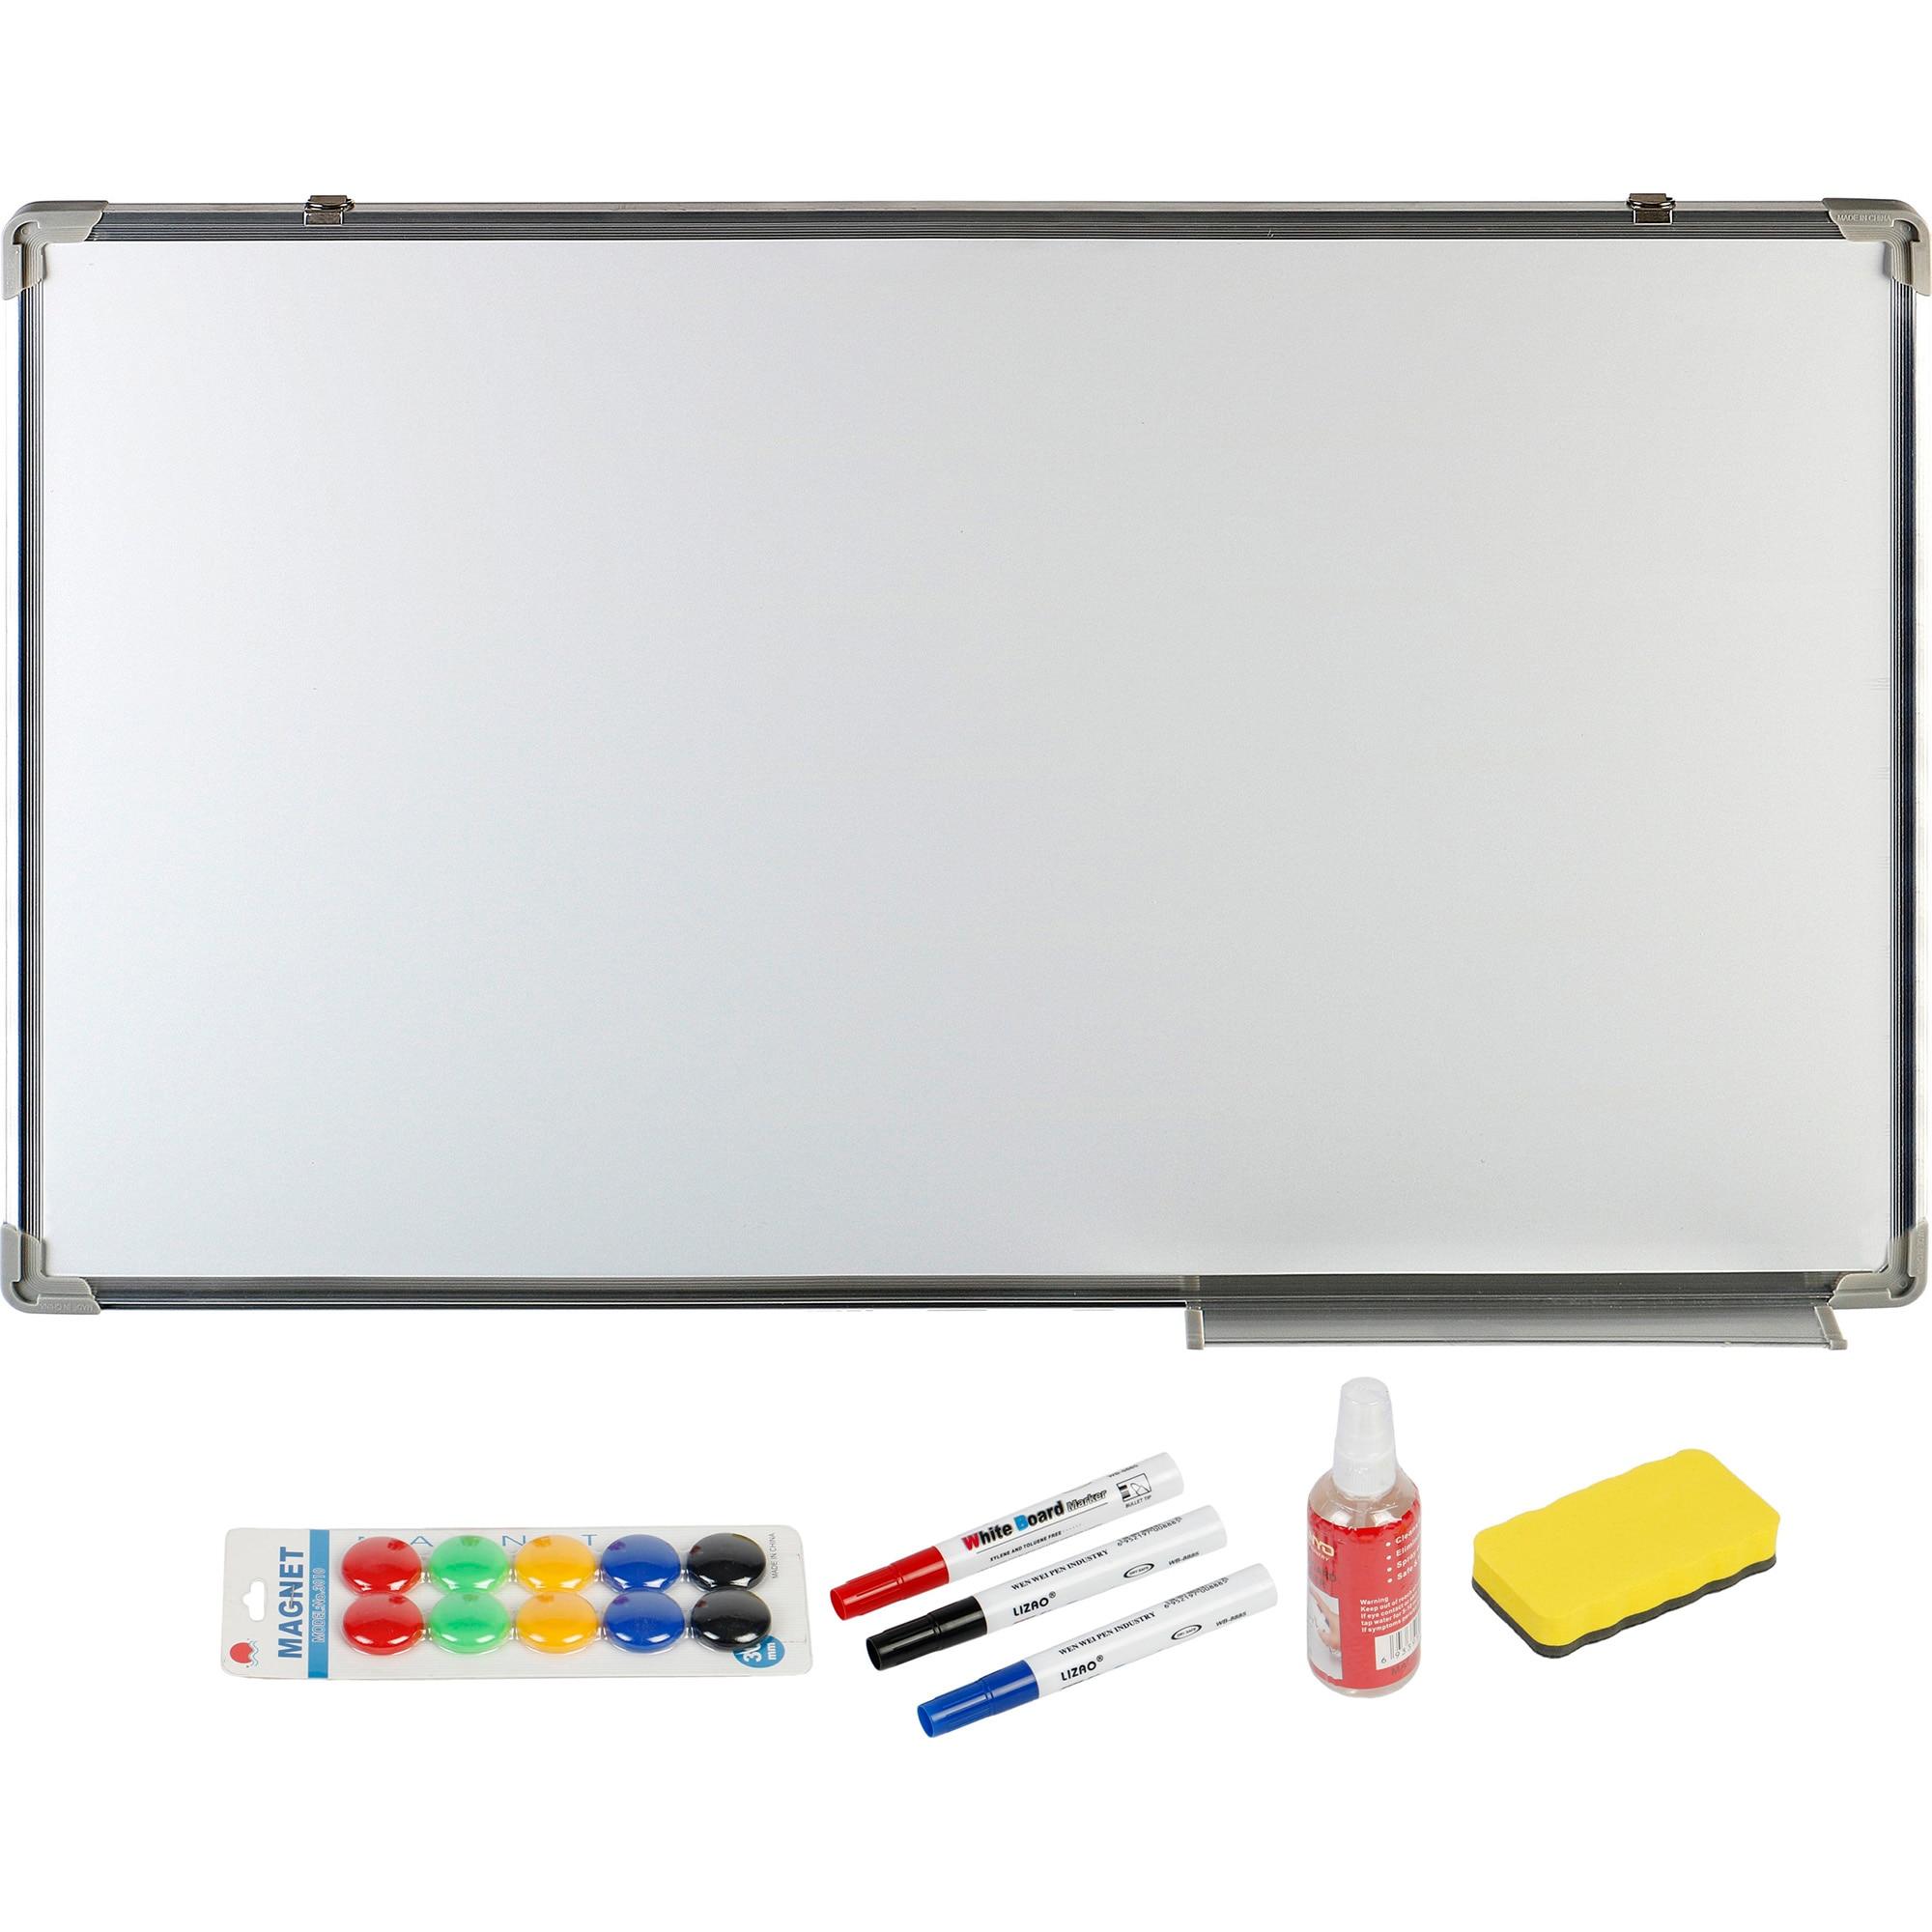 Fotografie Tabla magnetica A+, 60 x 90 cm si accesorii, markere, burete, spray, magneti